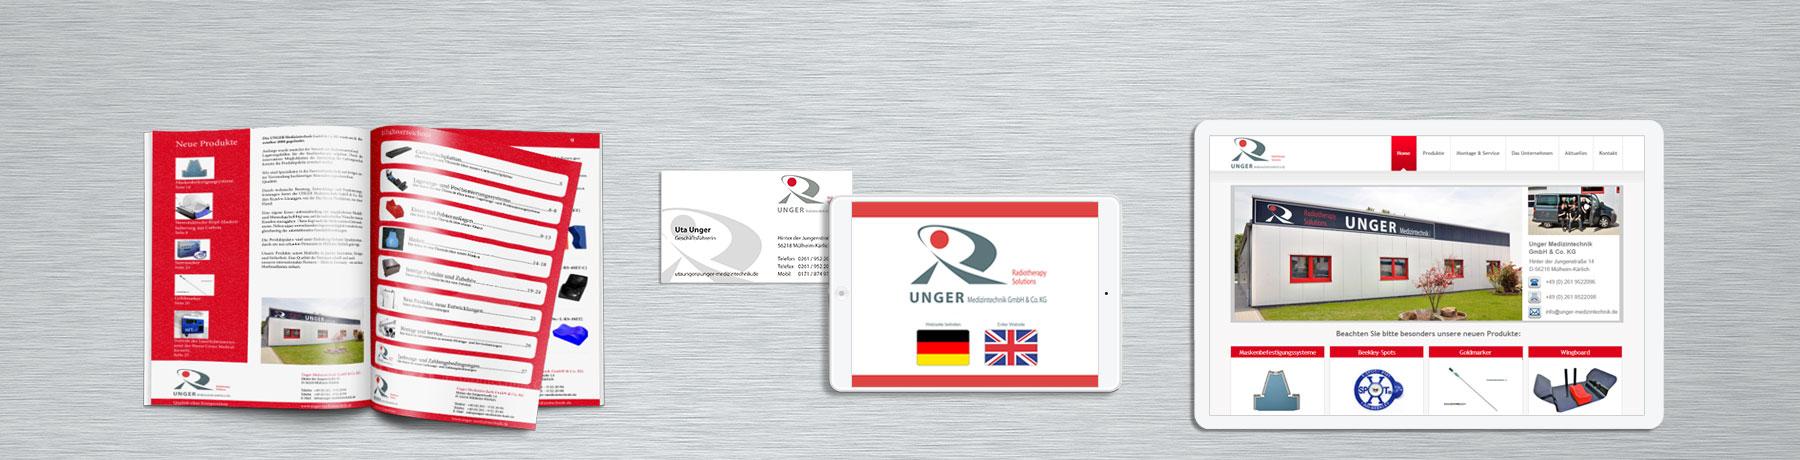 Webagentur in 33129 Delbrück / Paderborn